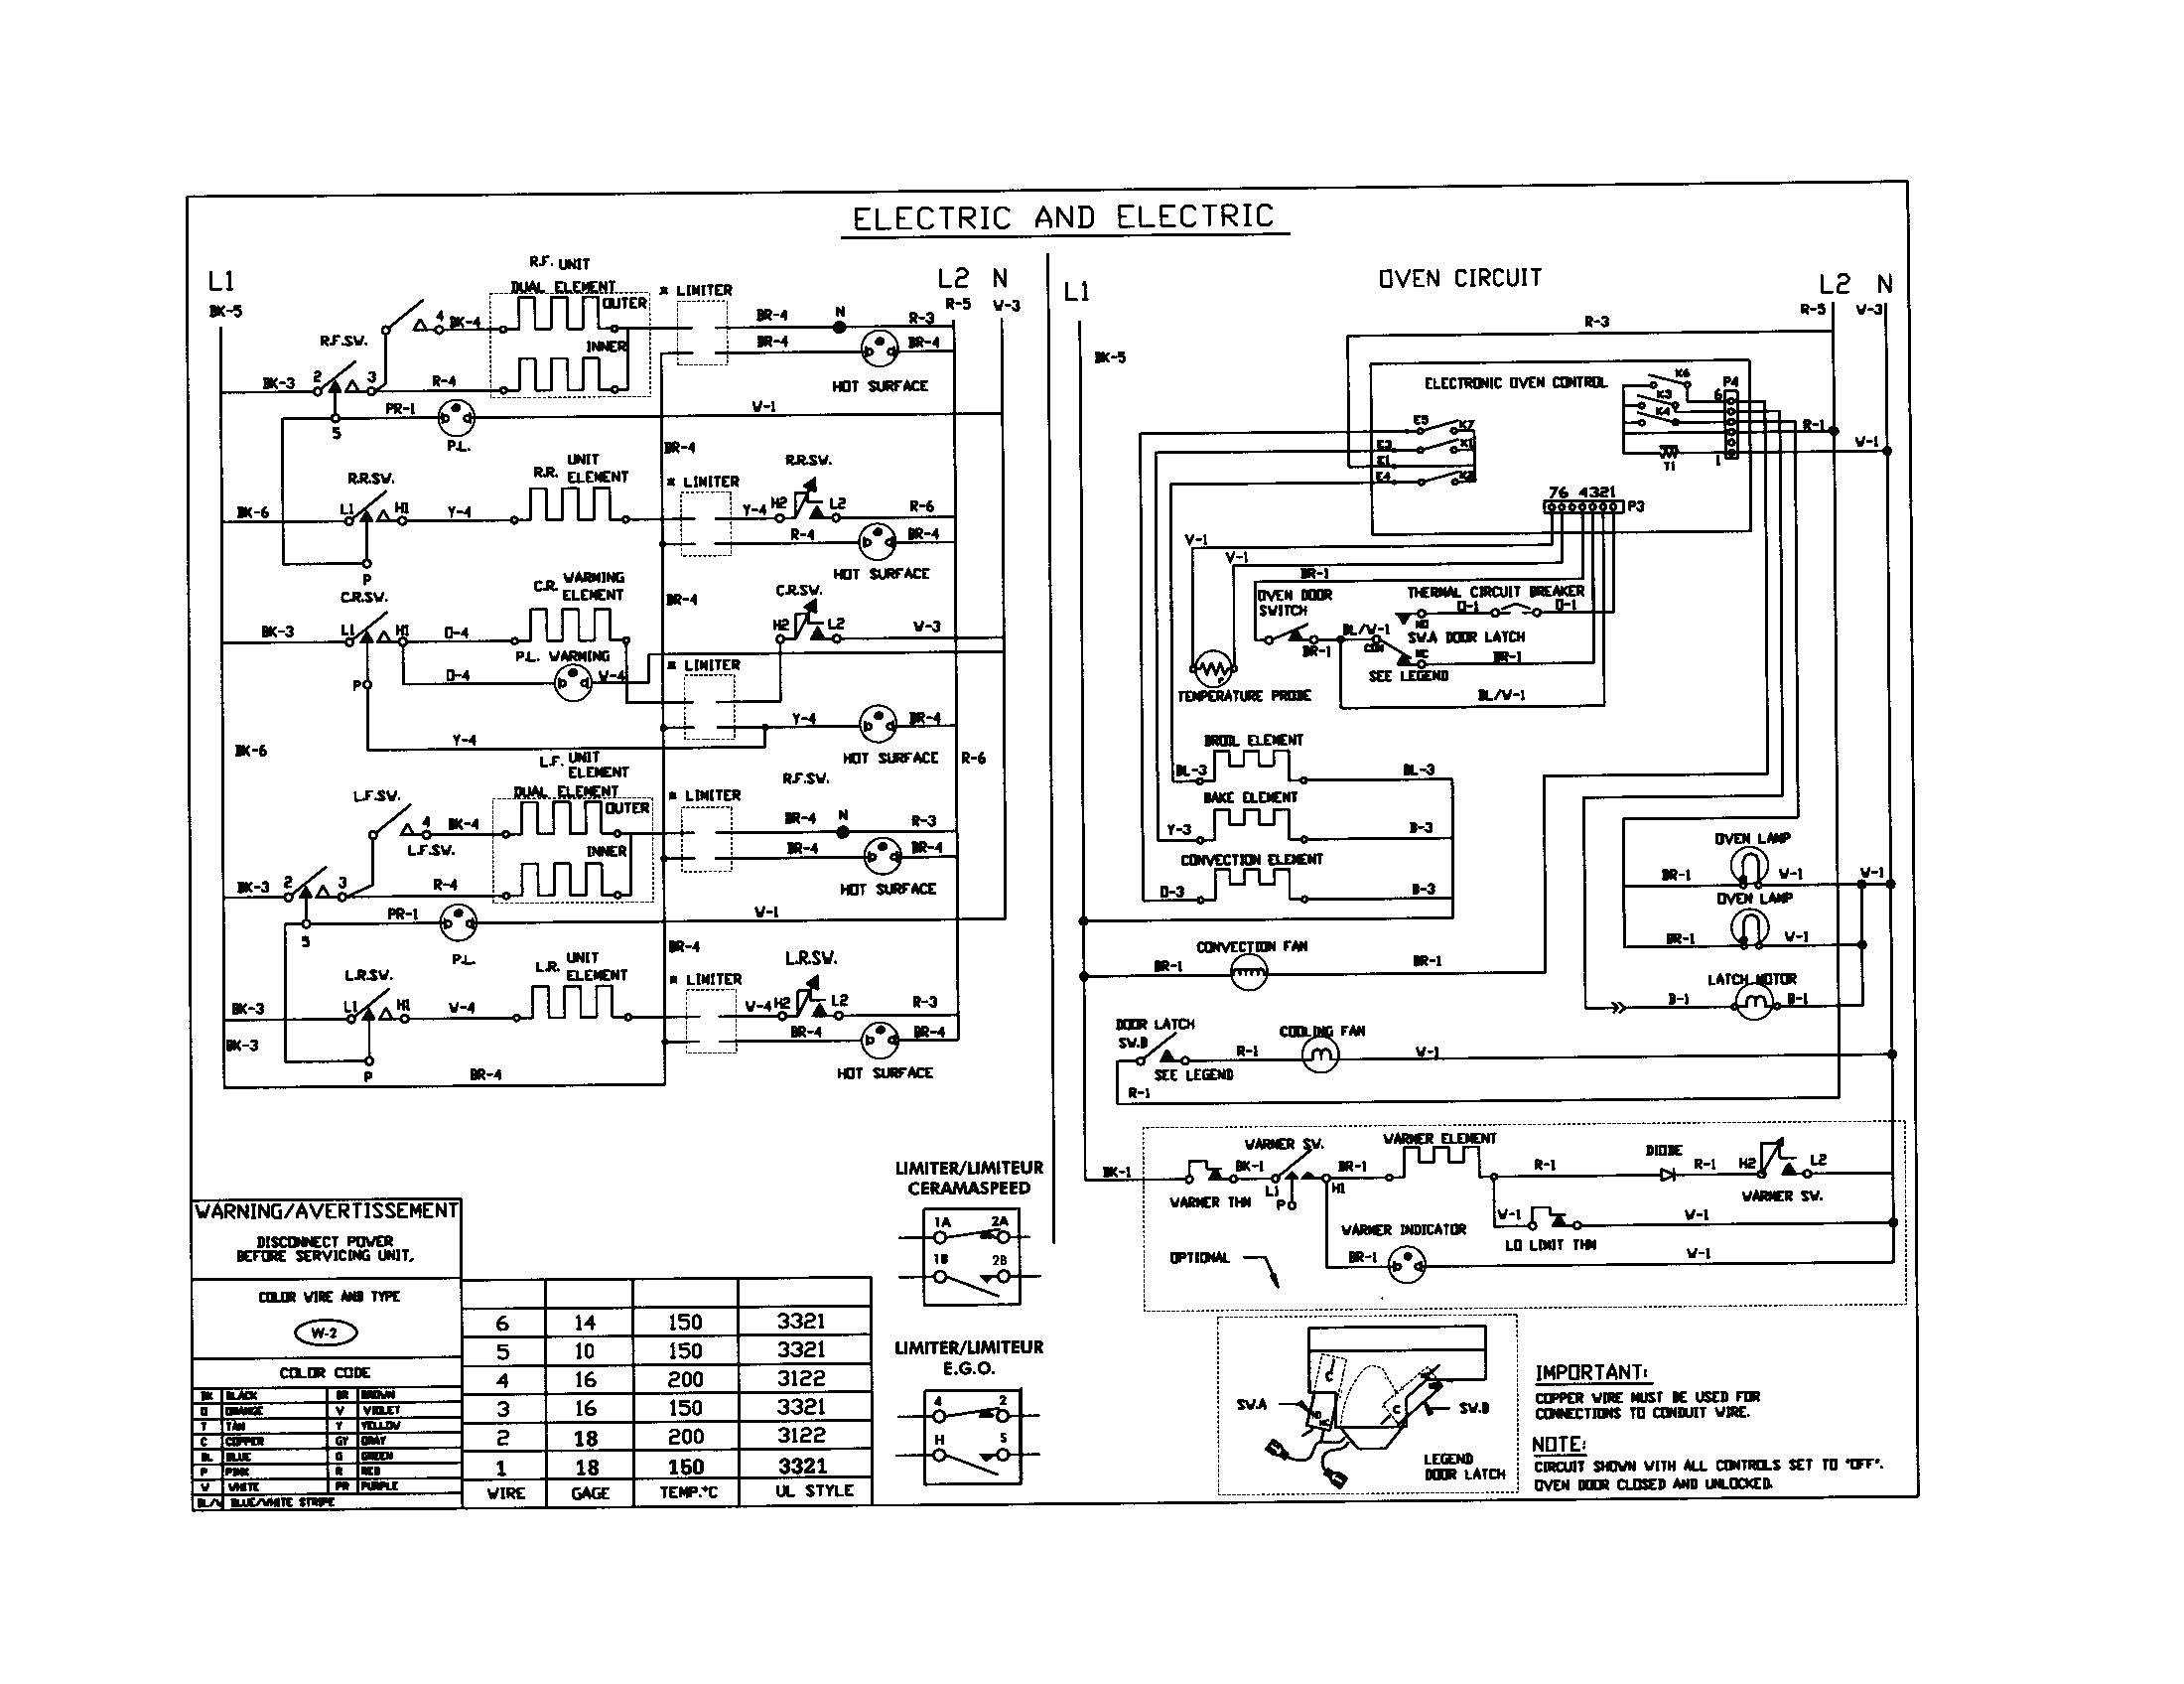 kenmore 110 wiring diagram wiring diagram reviewkenmore oasis dryer wiring diagram wiring diagram show kenmore elite